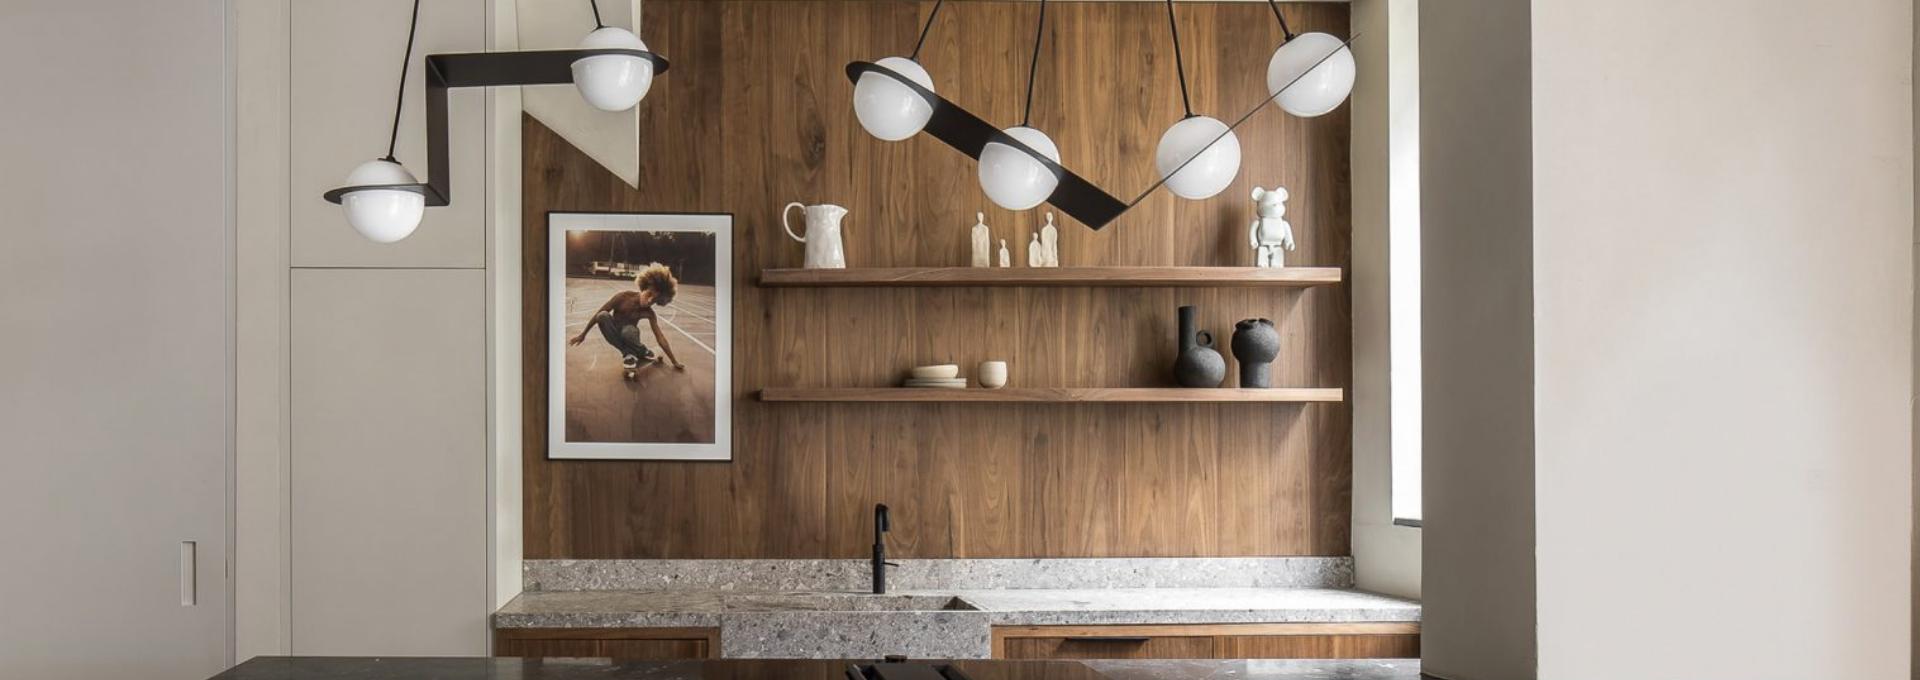 Barde + vanVoltt Studio transforms Amsterdam garage into family home